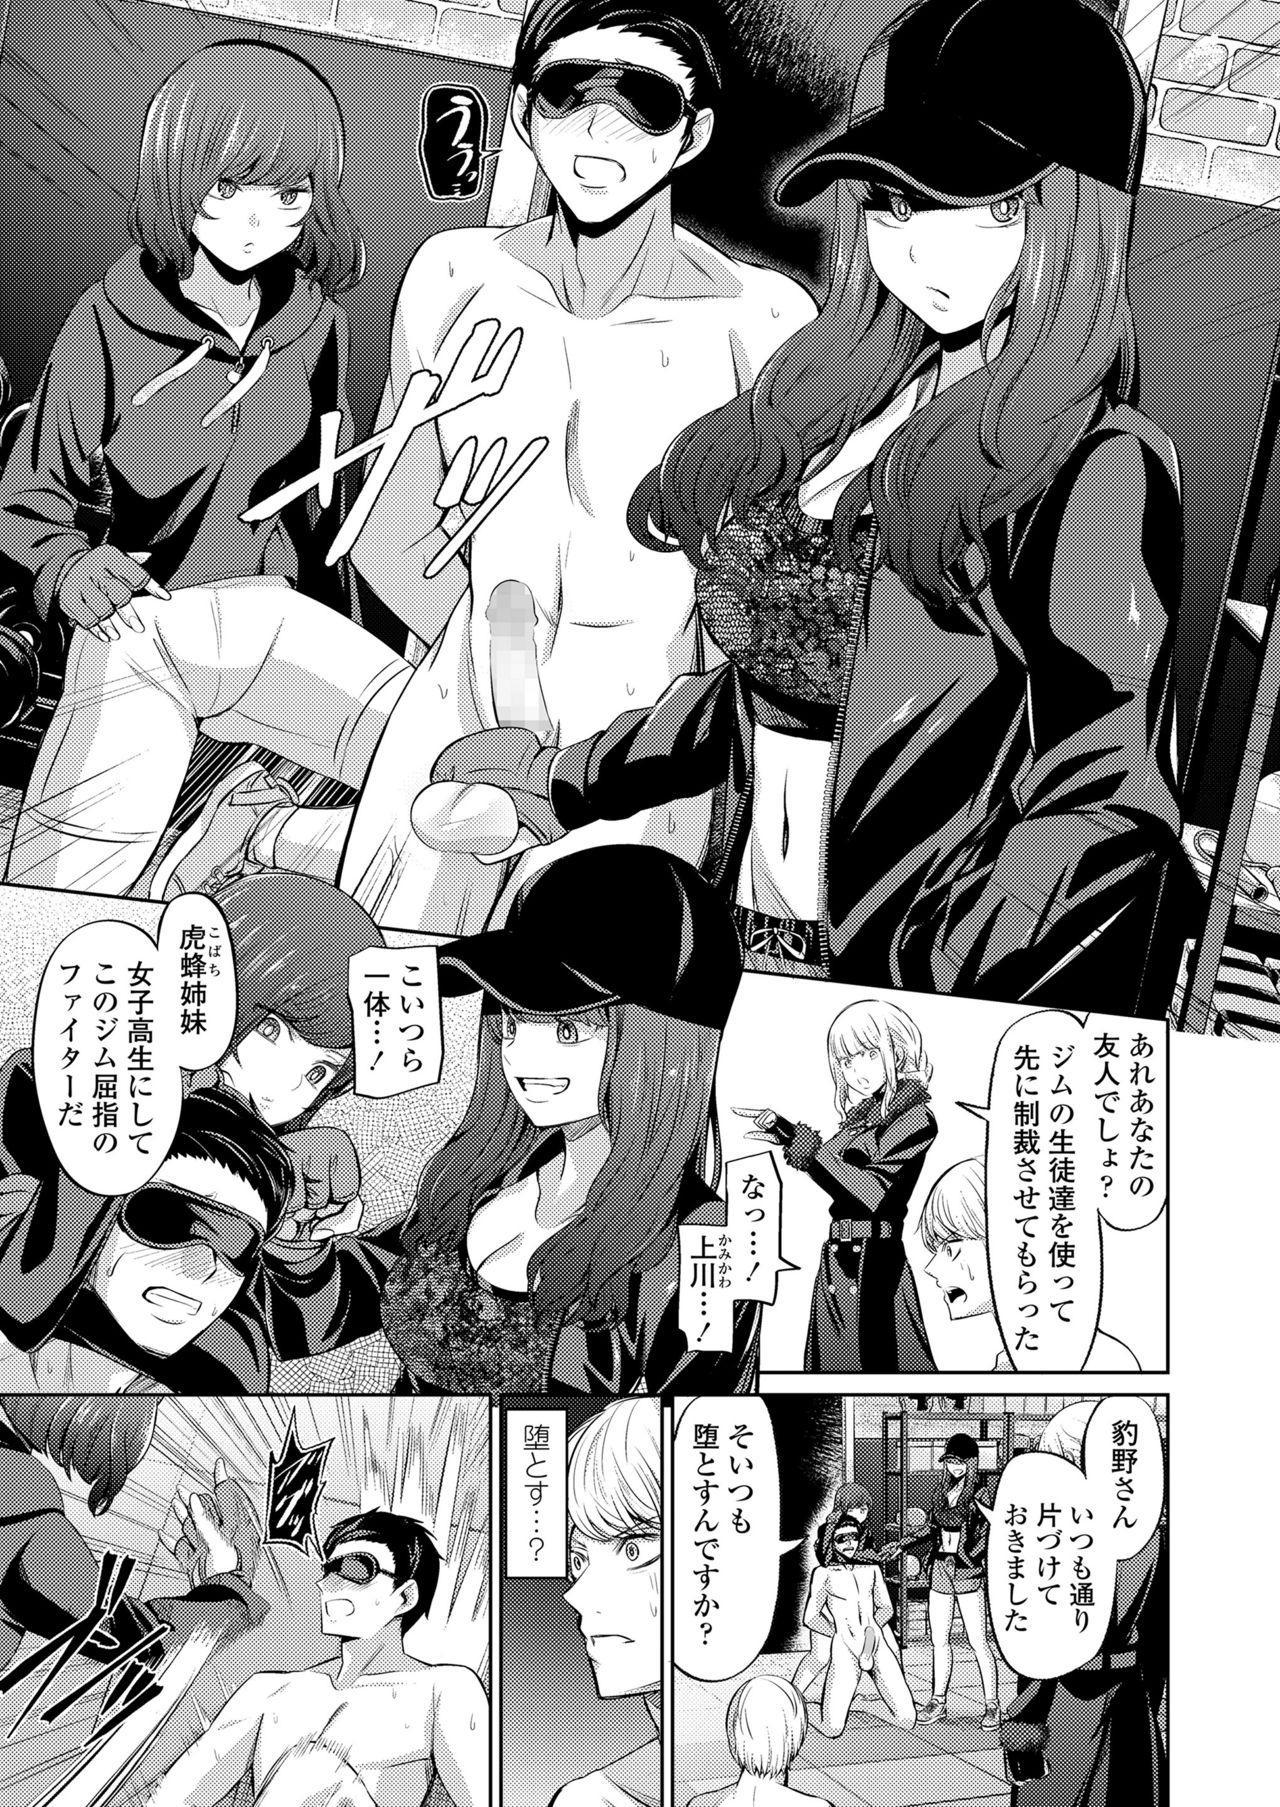 Girls forM Vol.19 110